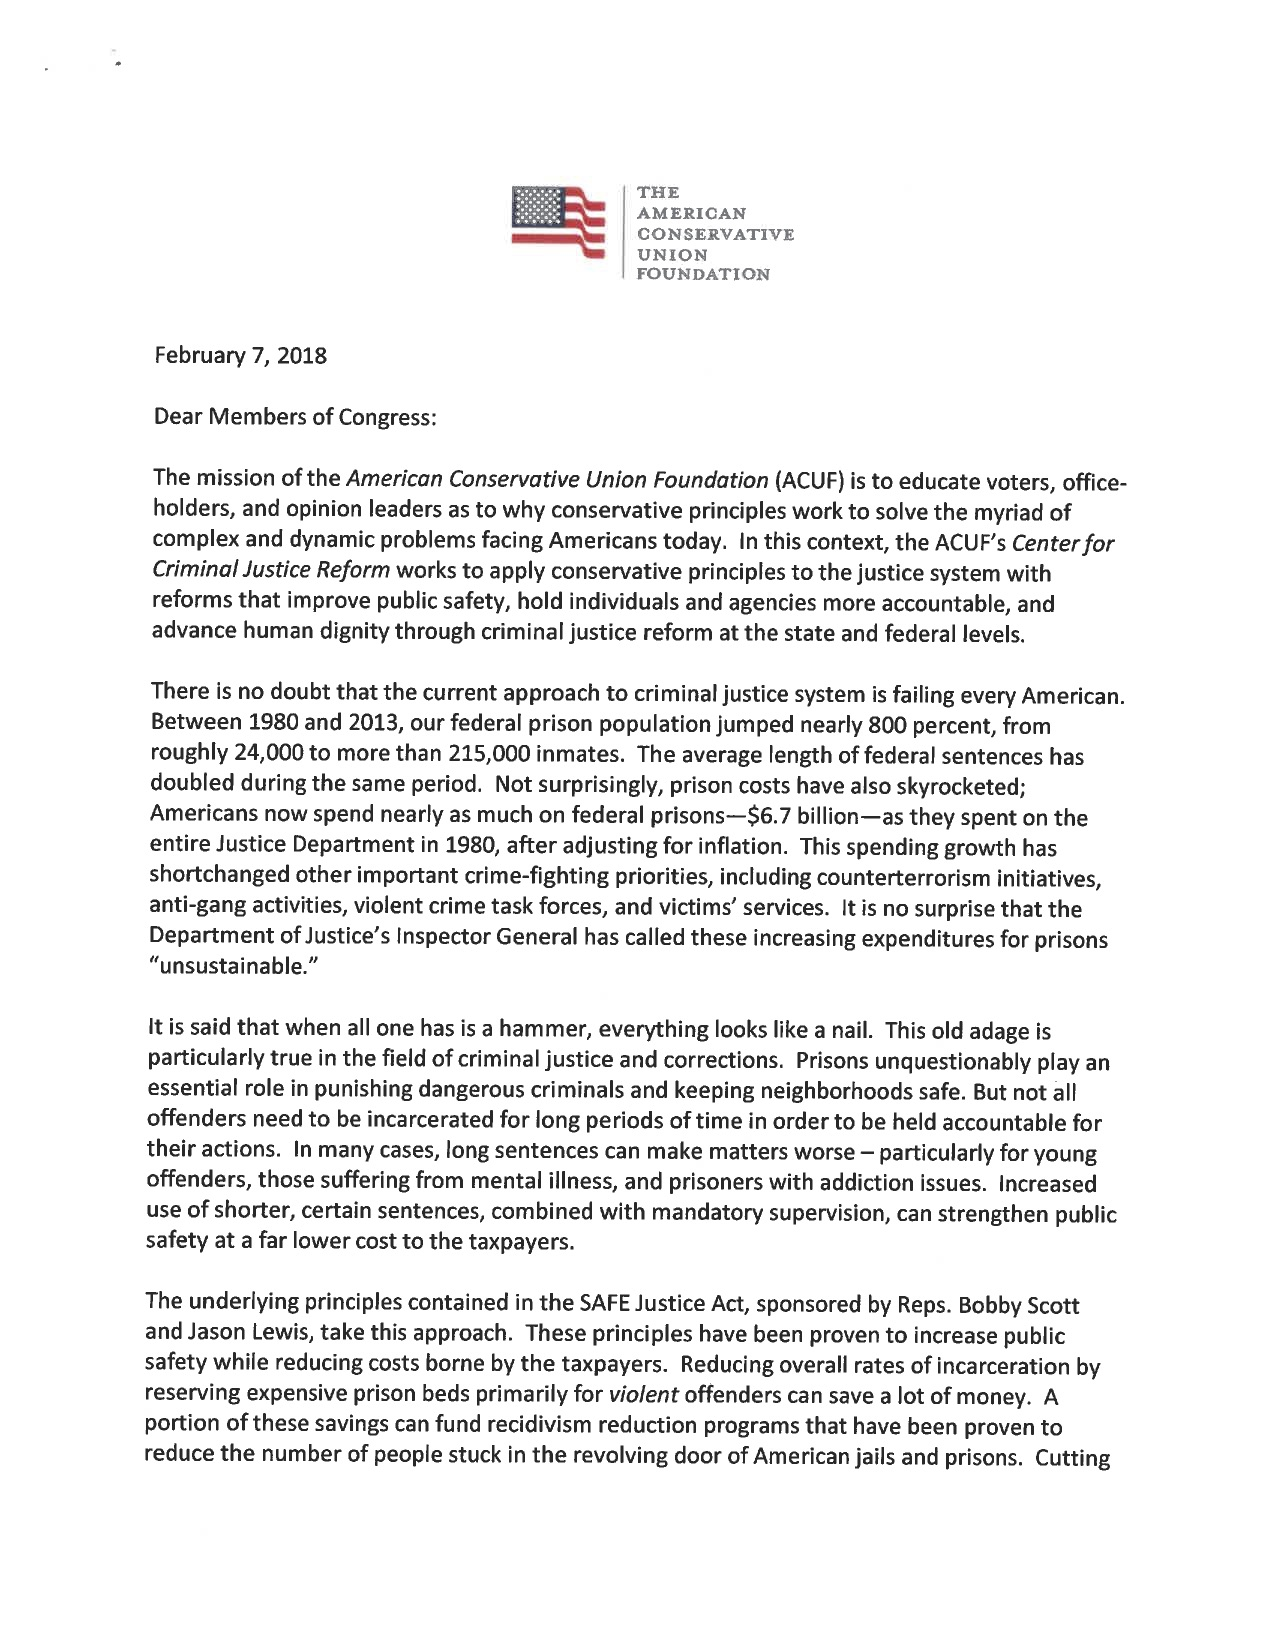 SAFE_Justice_Act_Letter_1.jpg